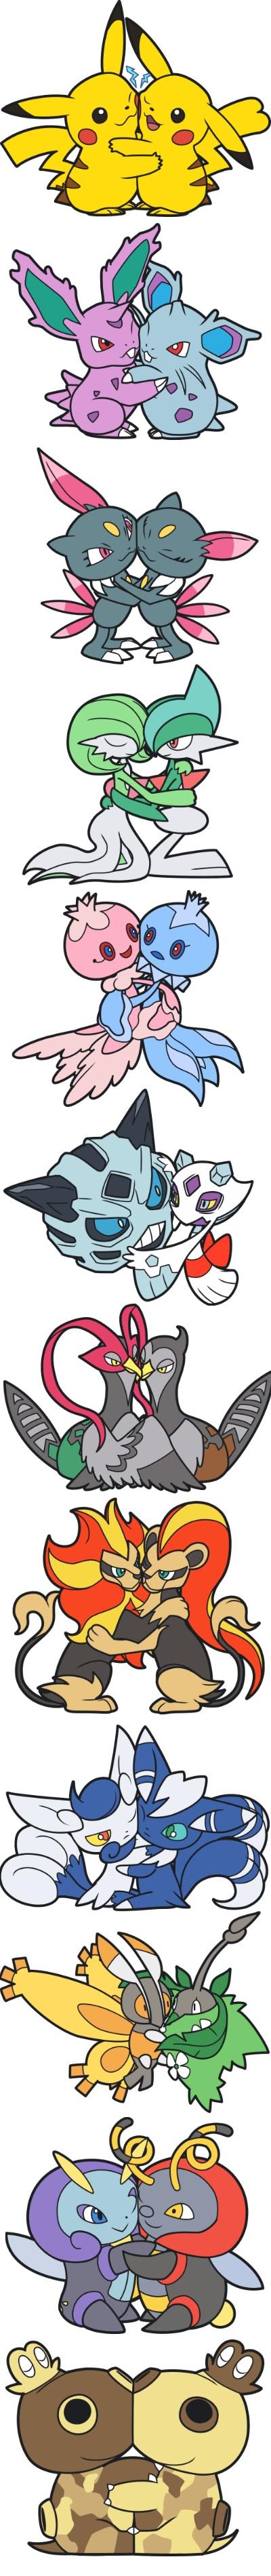 Tags: Anime, Pokémon, Mothim, Nidoran, Pikachu, Illumise, Gallade, Volbeat, Hippopotas, Gardevoir, Unfezant, Glalie, Meowstic